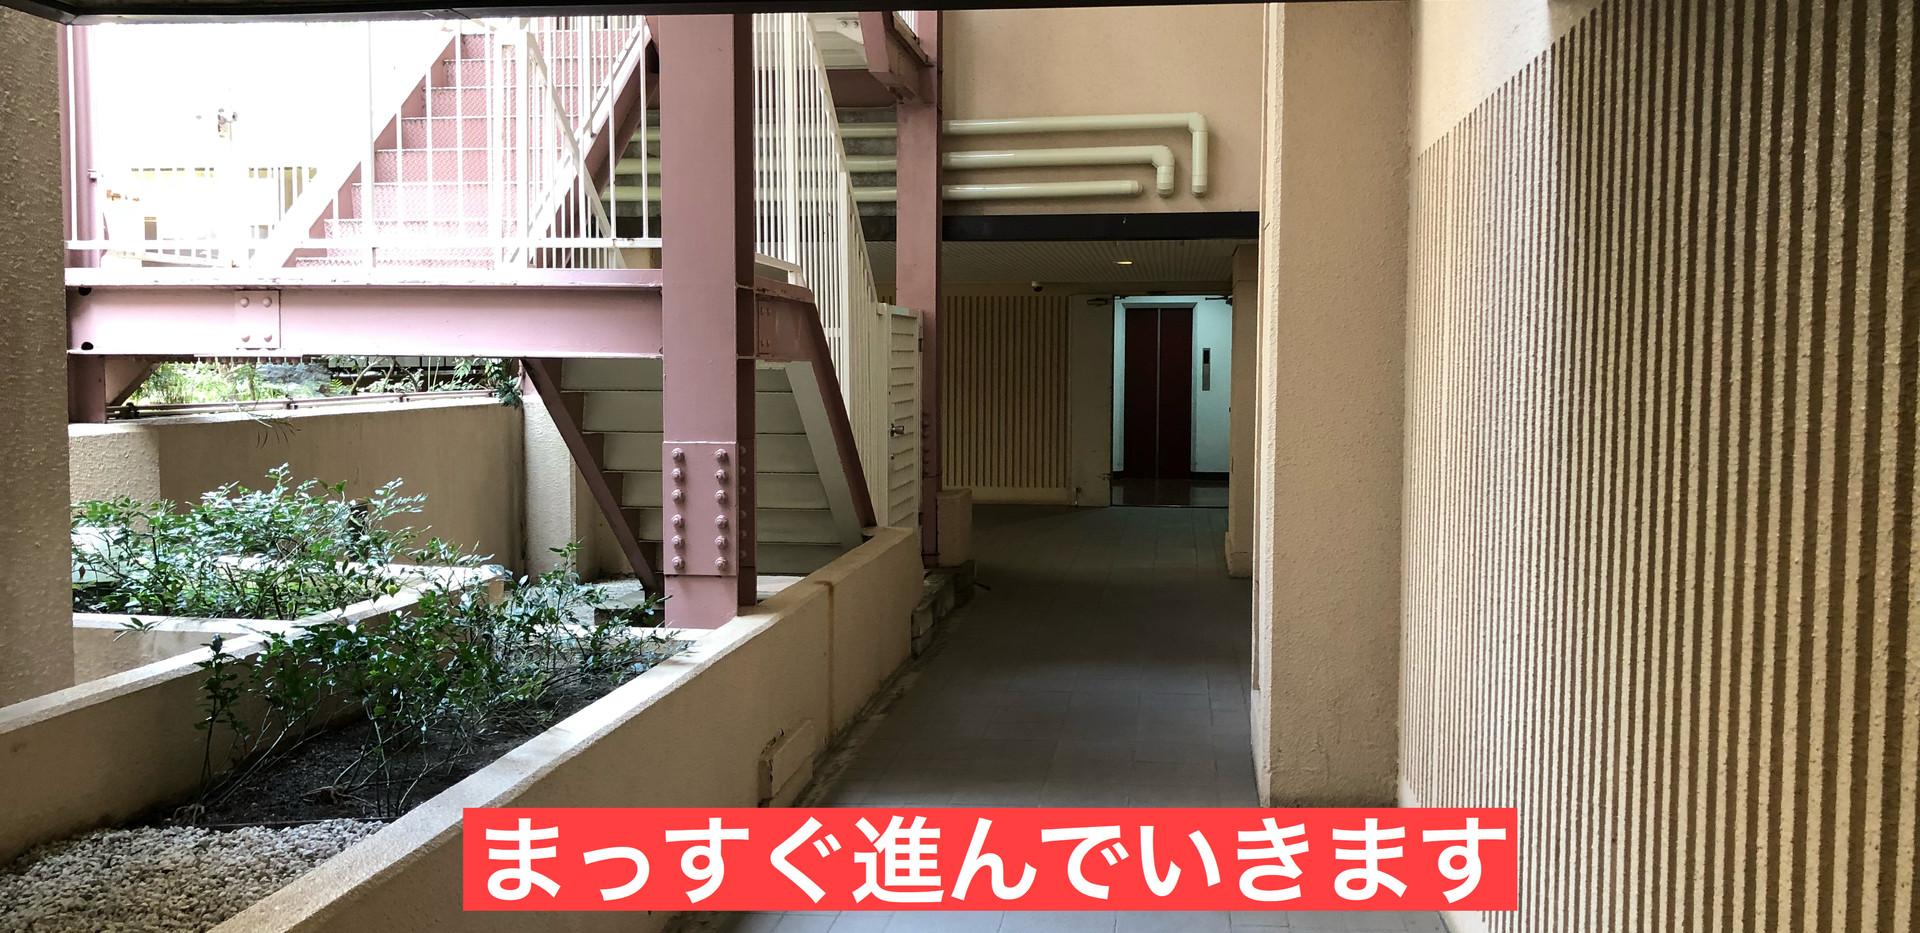 access06